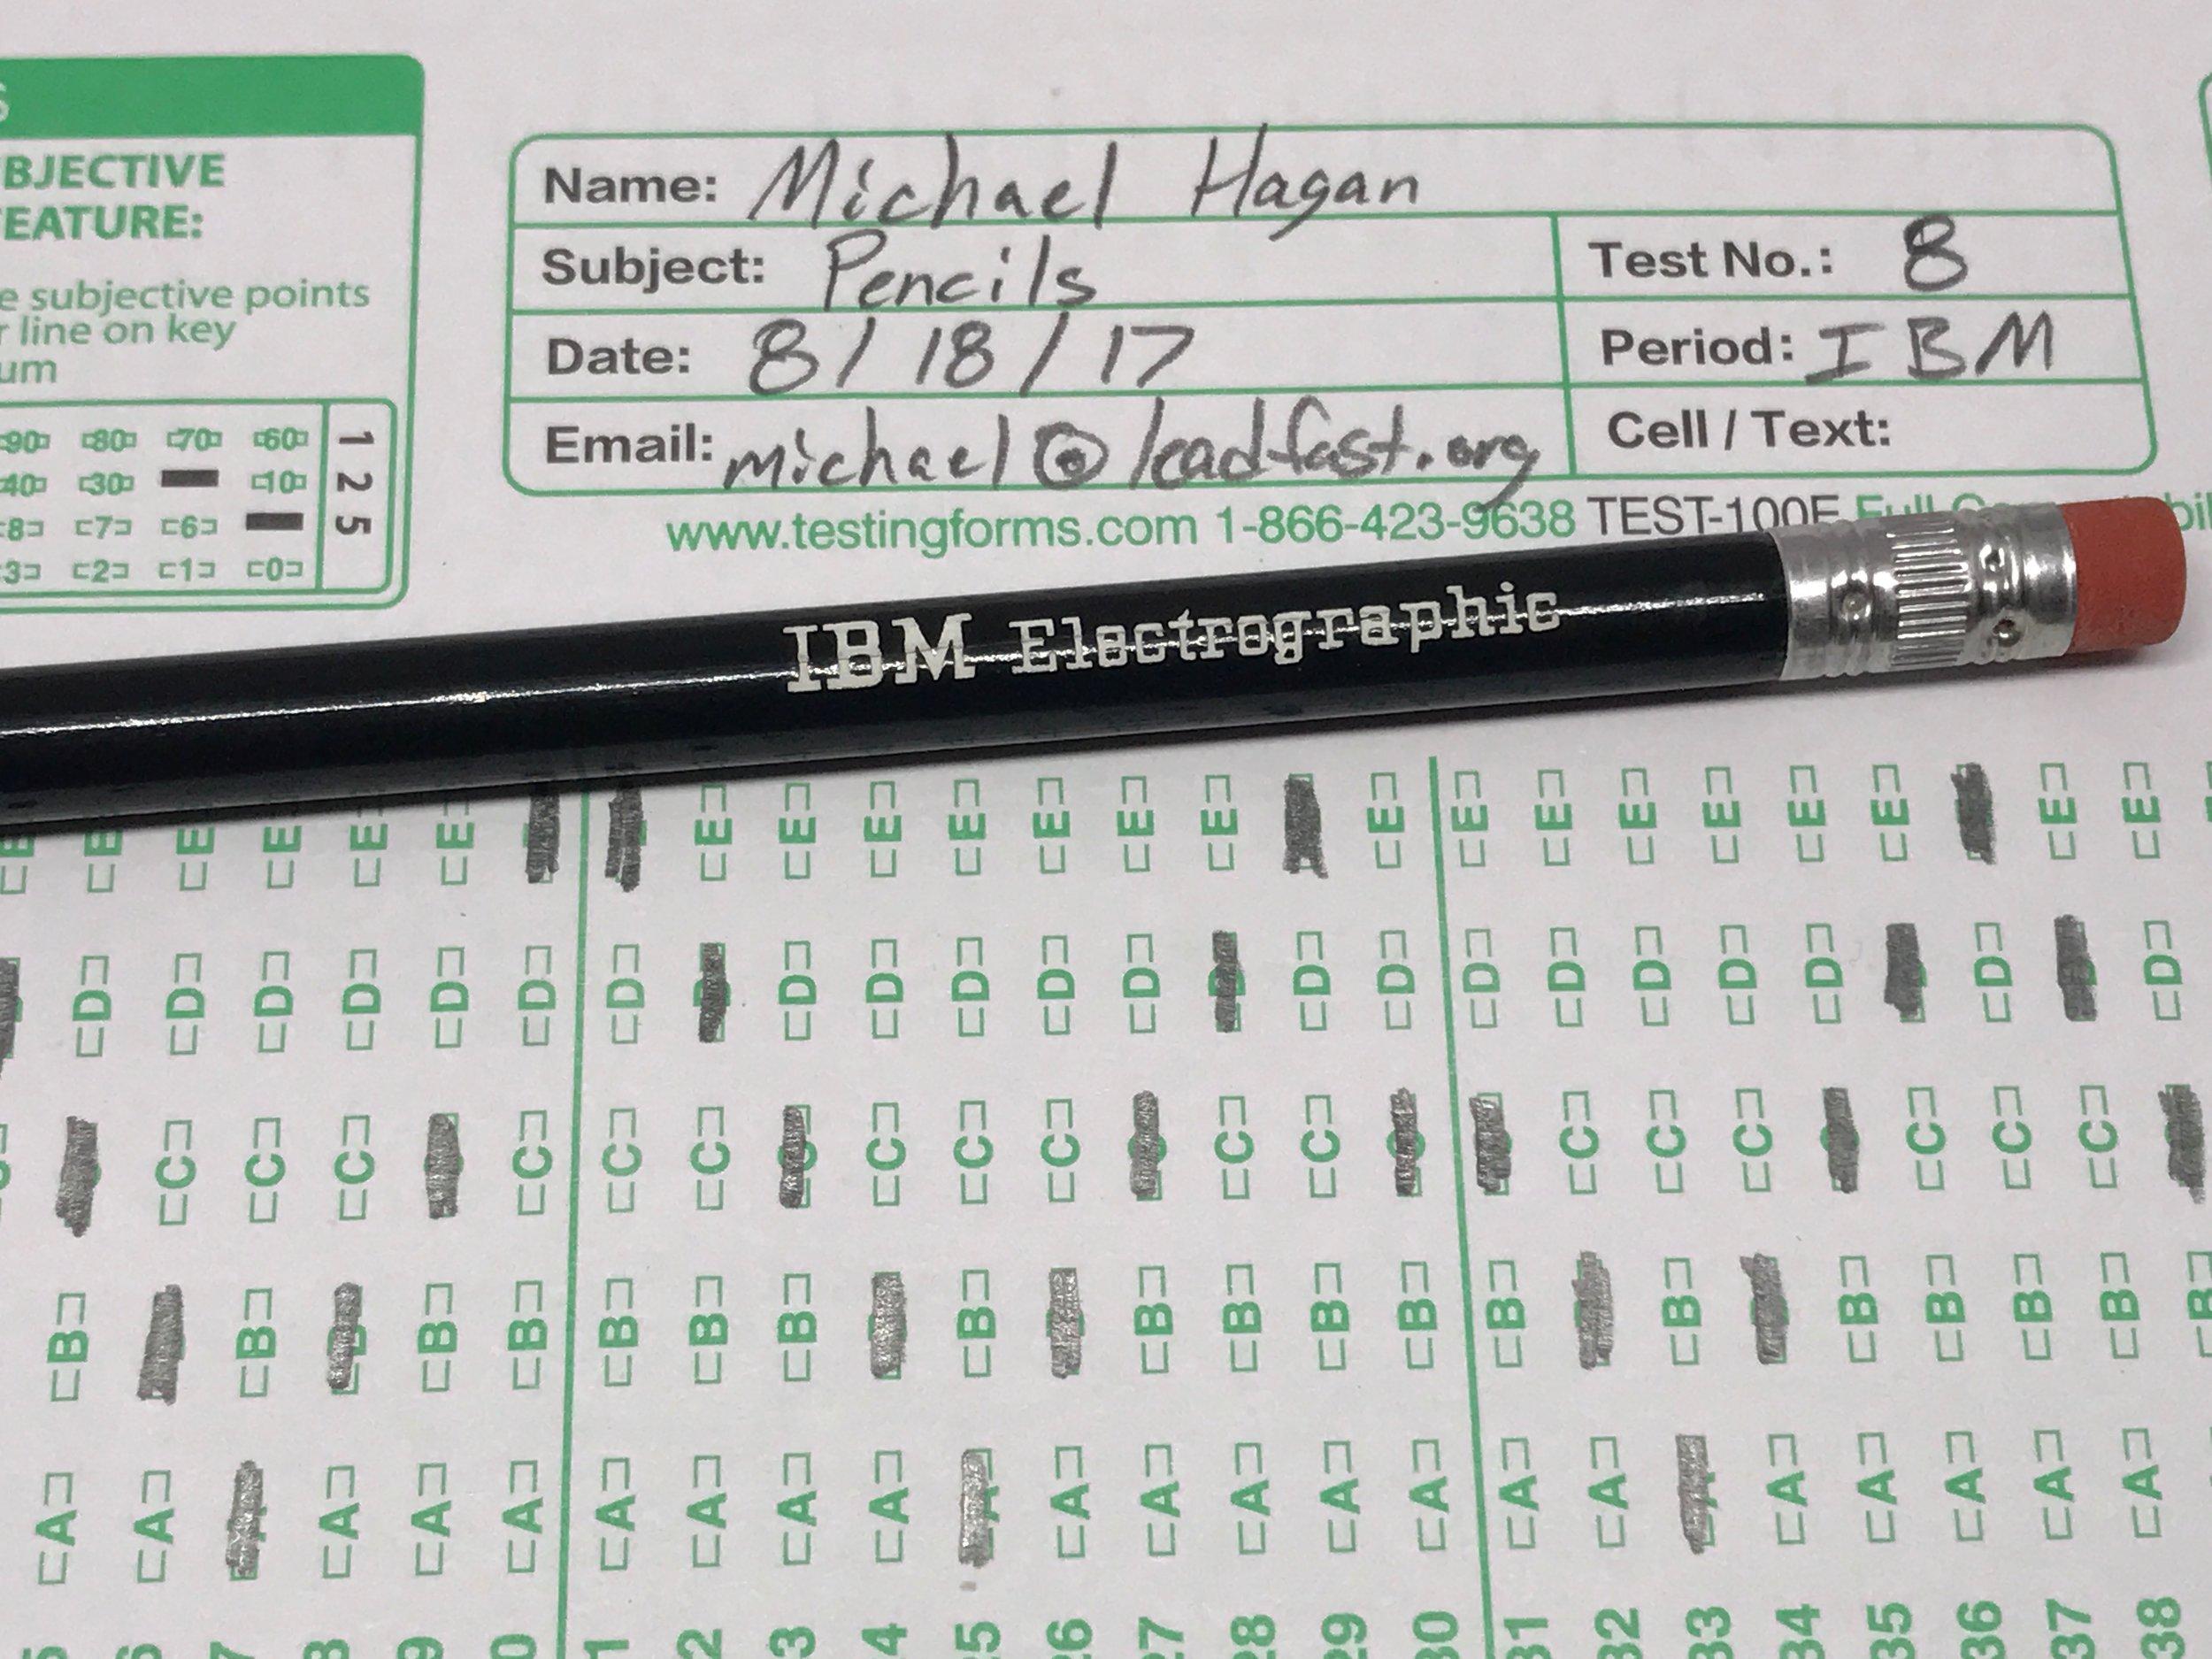 IBM-Electrographic-Dixon-sensamark-10.jpg